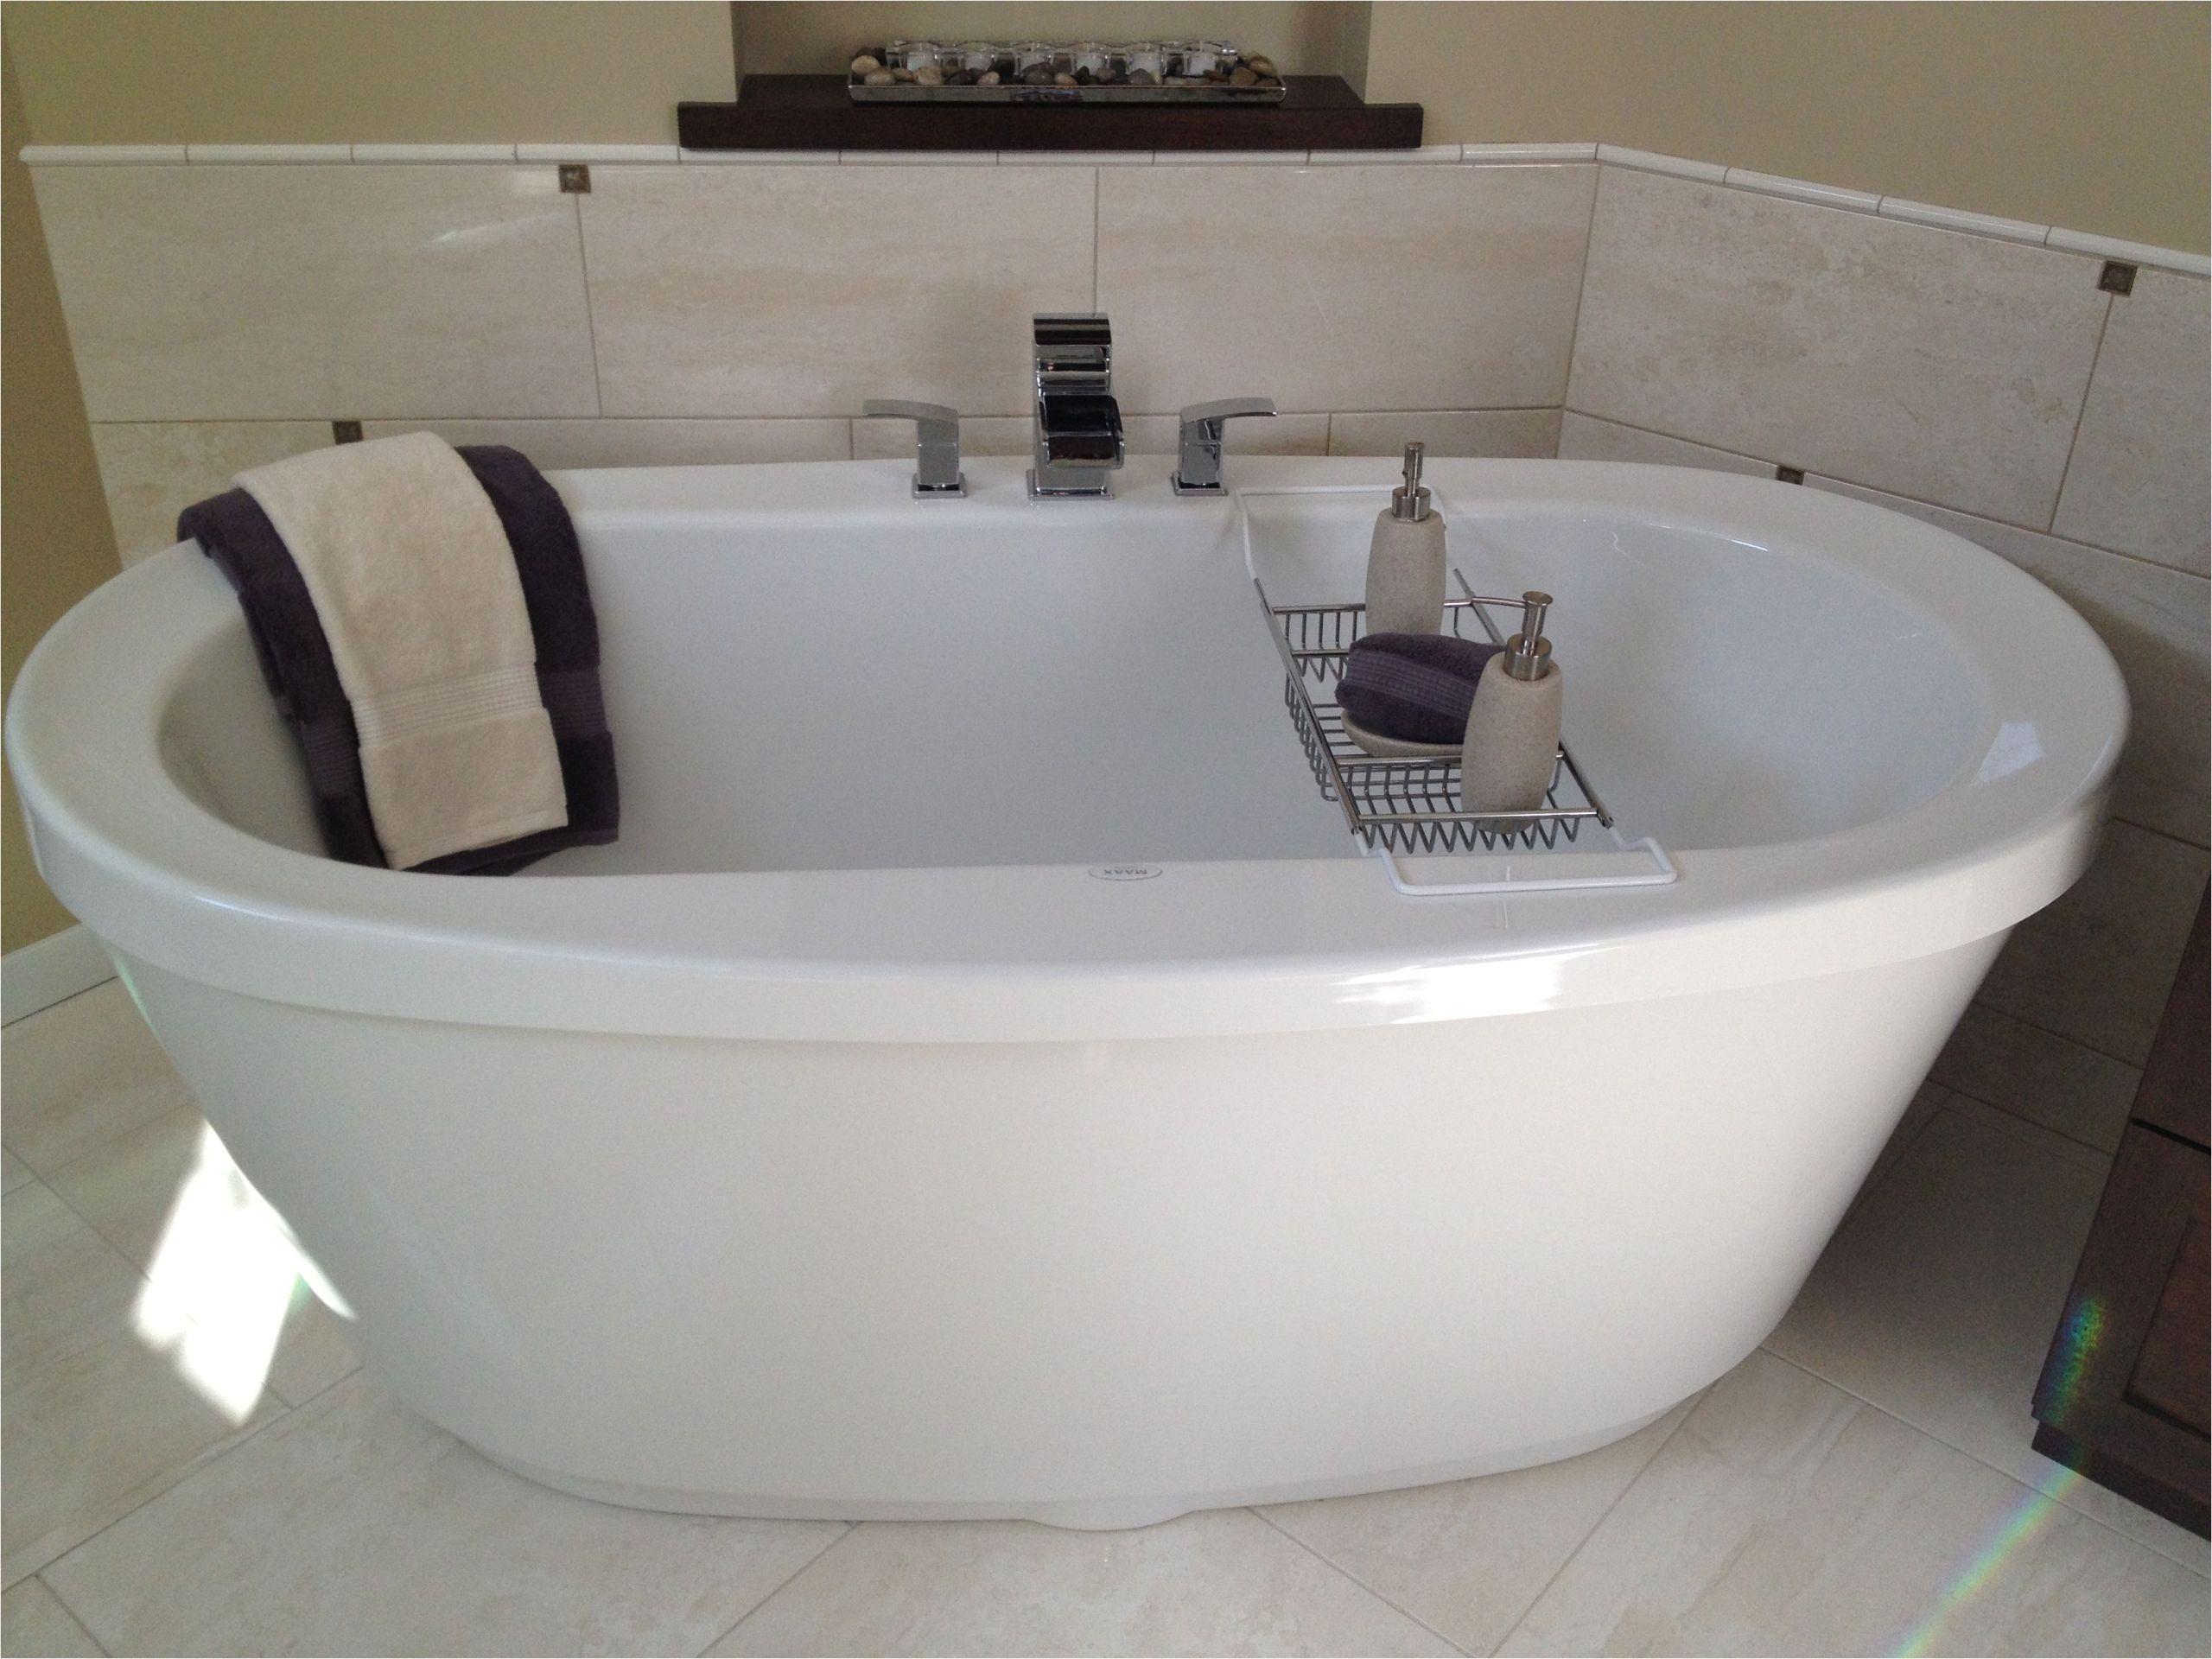 Most Comfortable Freestanding Bathtub Maxx Tub the Most fortable Tub Ever